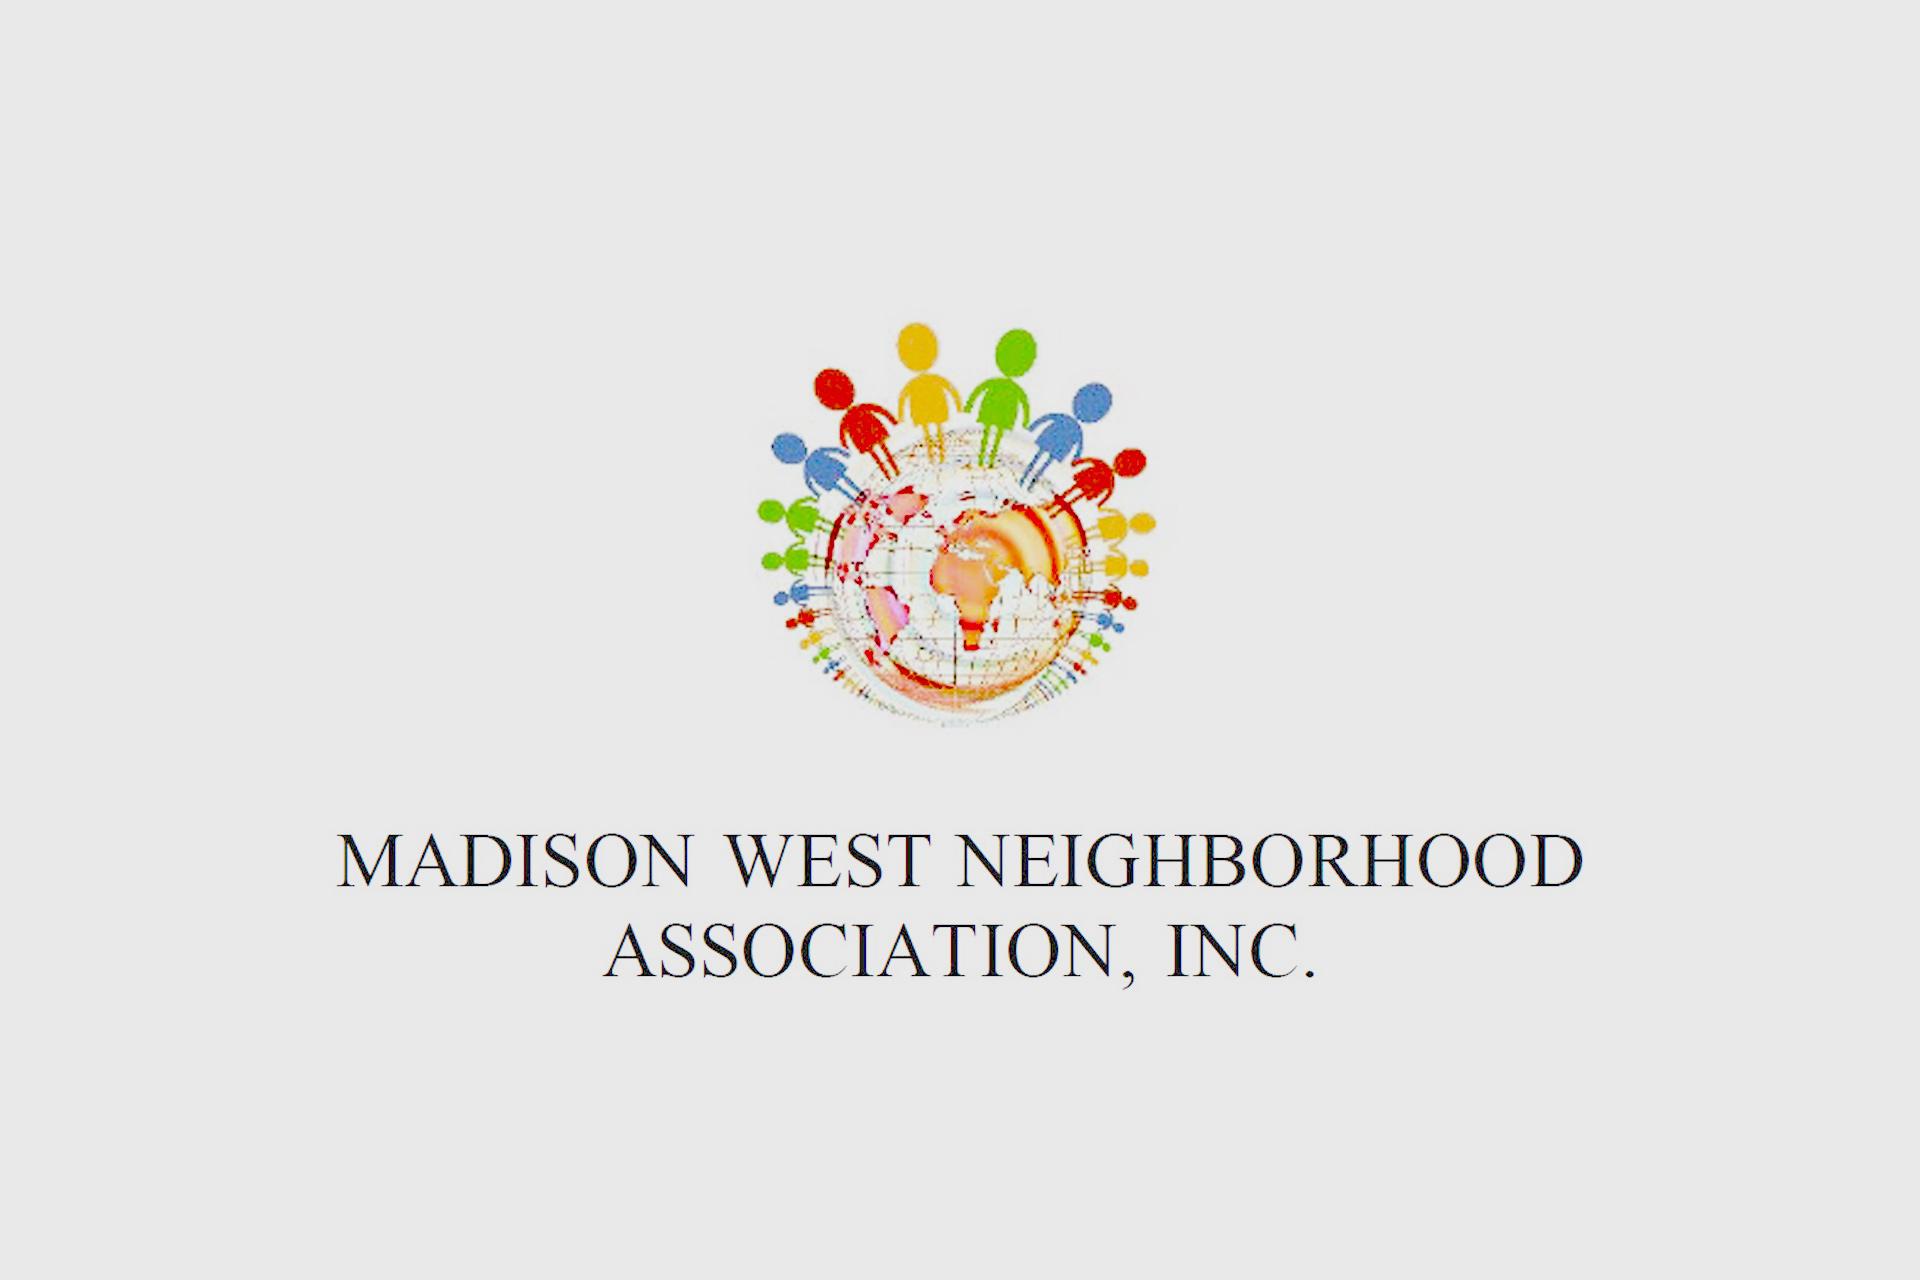 Madison West Neighborhood Association